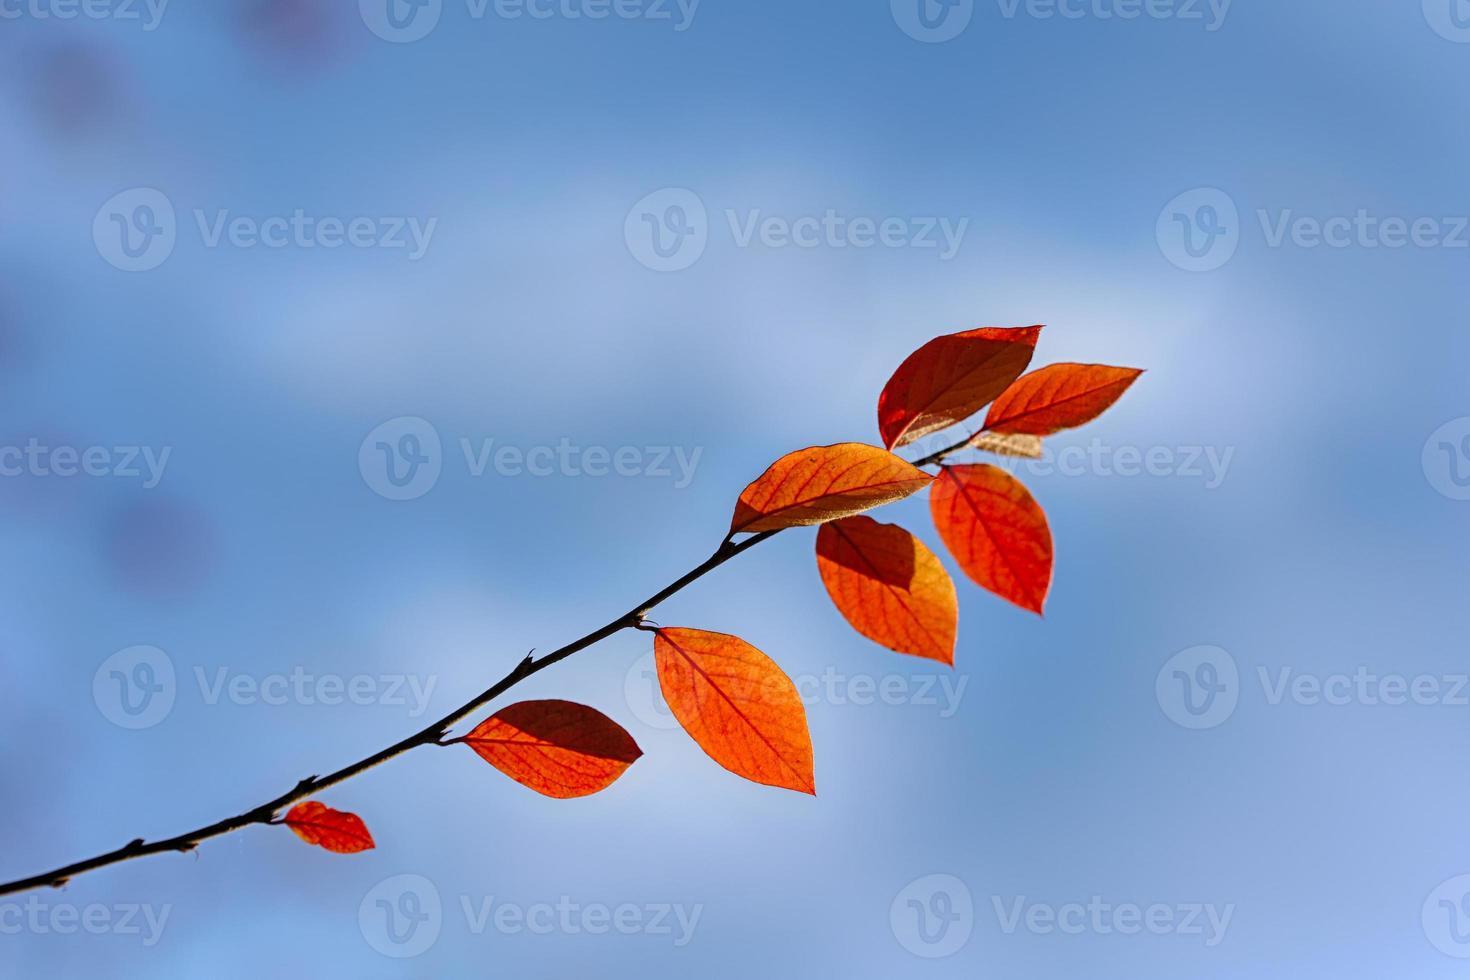 herfst close-up foto